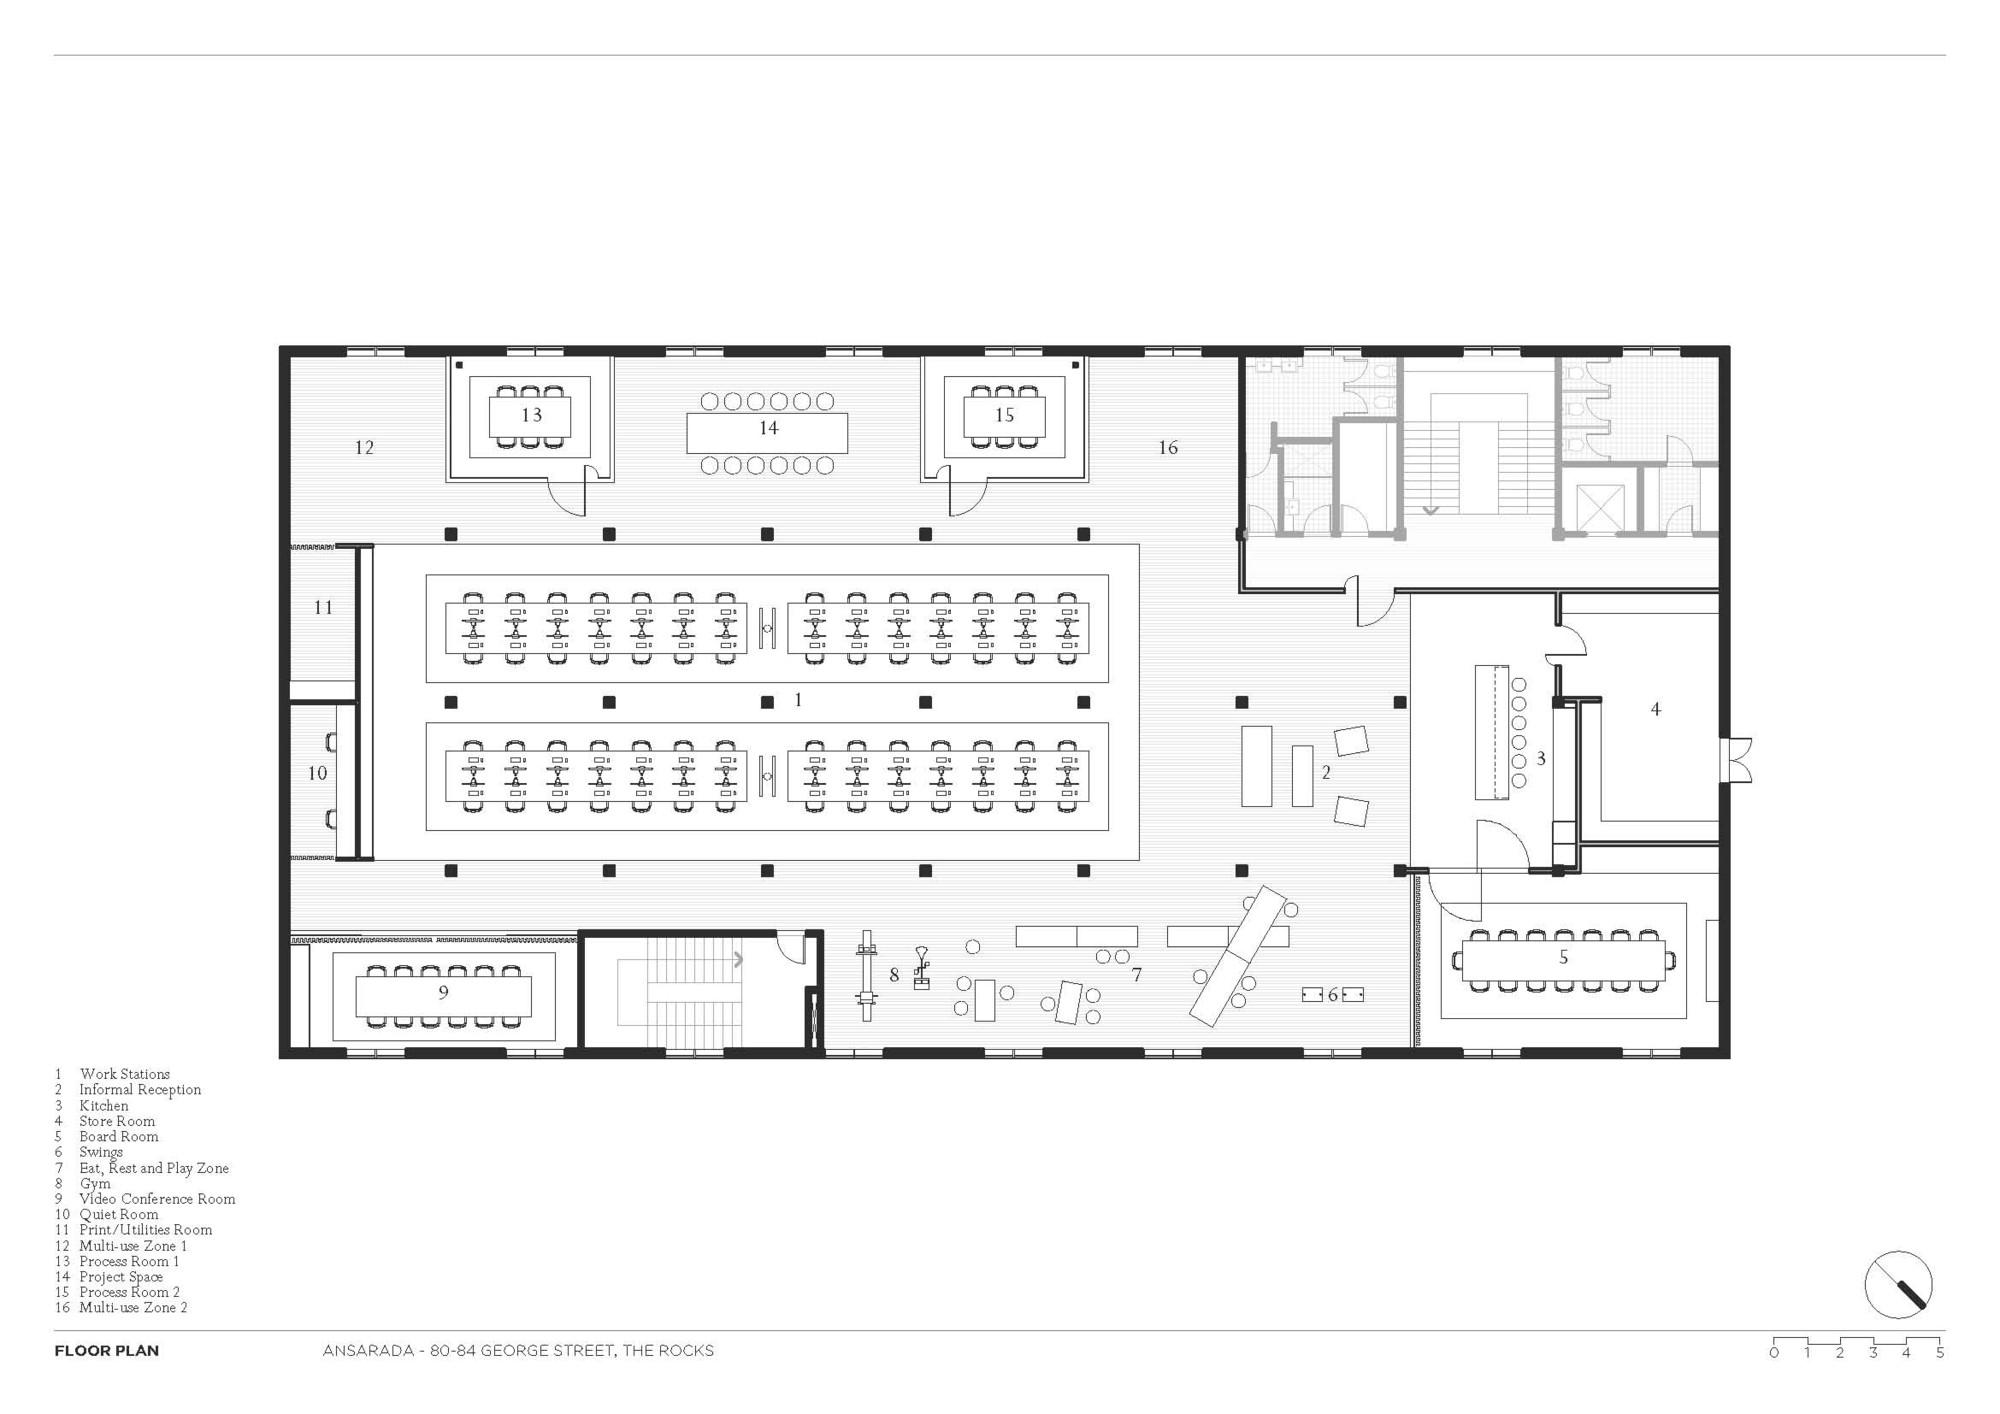 Gallery Of Ansarada / Those Architects